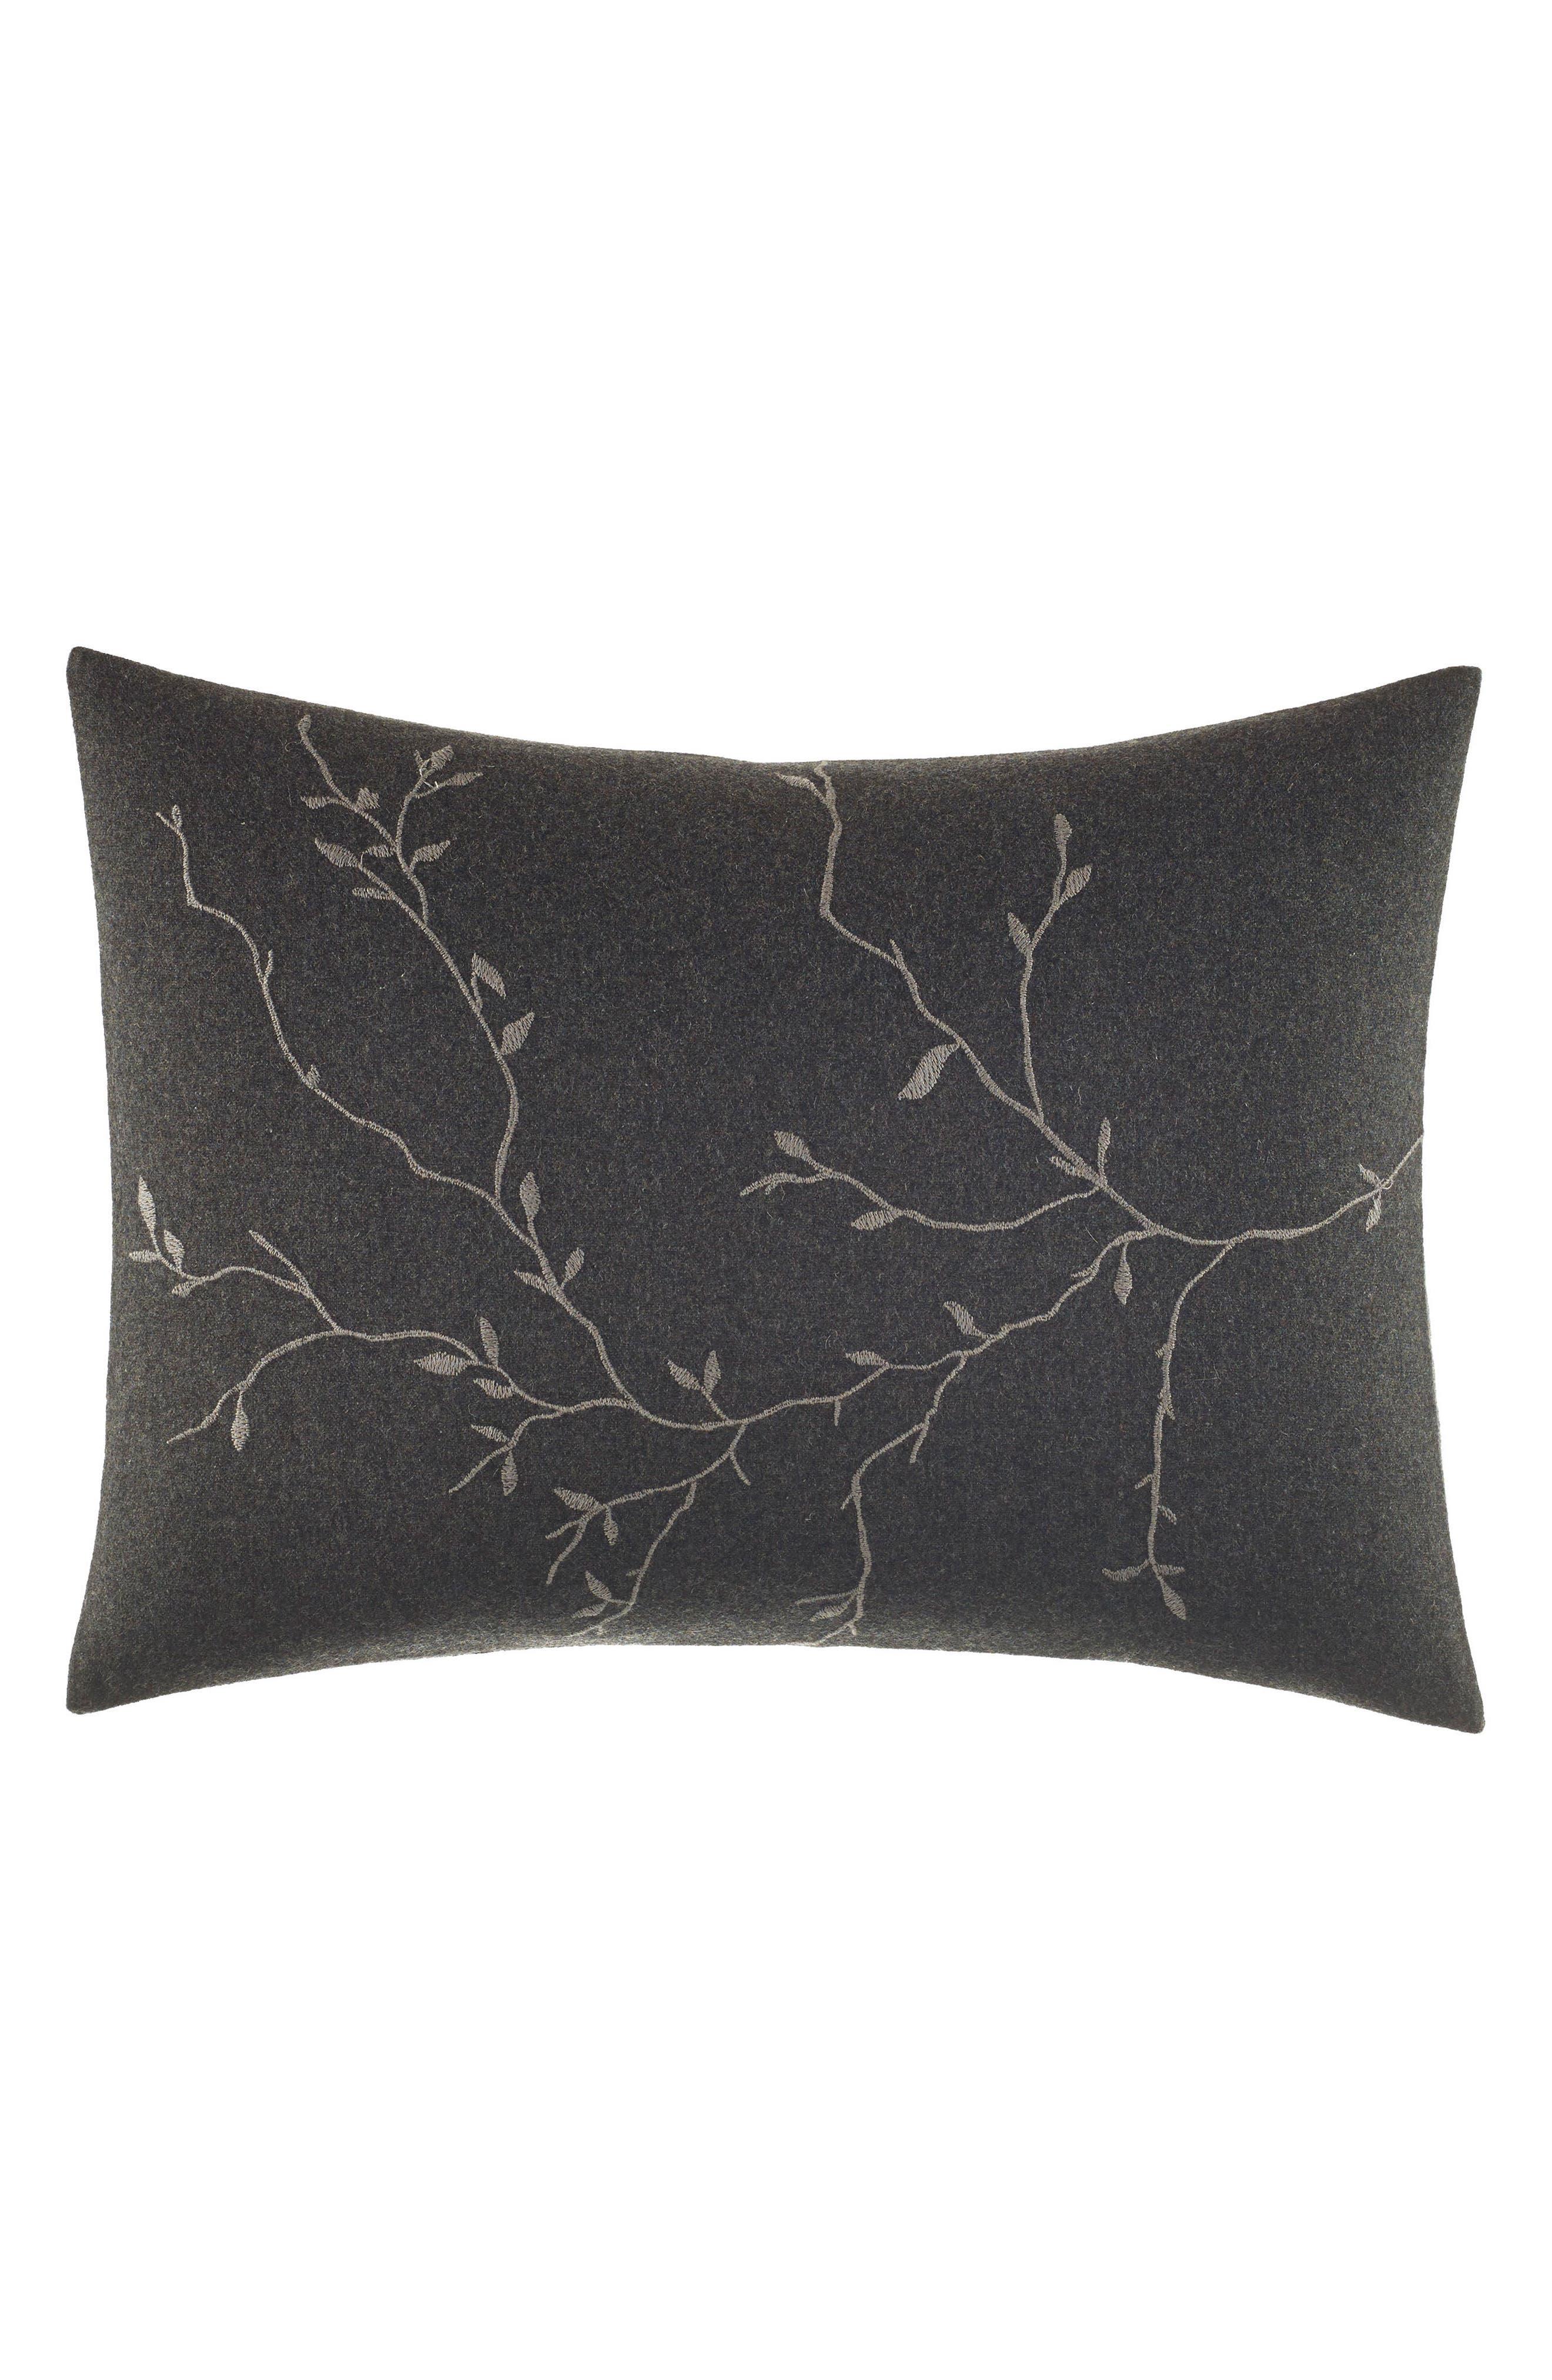 Charcoal Floral Vine Accent Pillow,                             Main thumbnail 1, color,                             Dark Gray